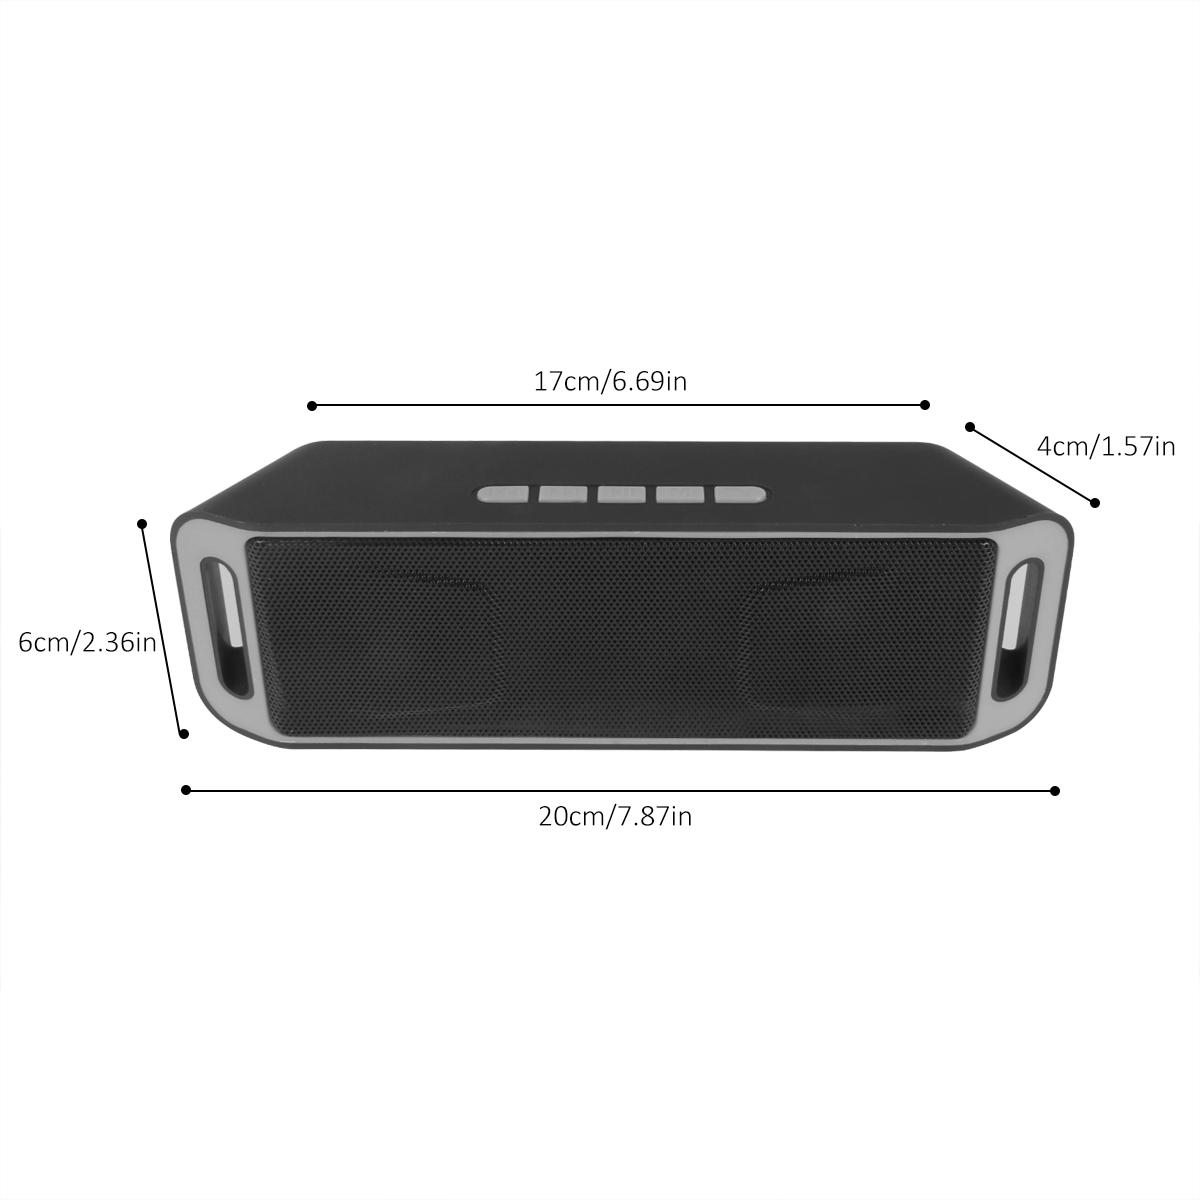 lautsprecher bluetooth musikbox dual hd bass sound mic. Black Bedroom Furniture Sets. Home Design Ideas